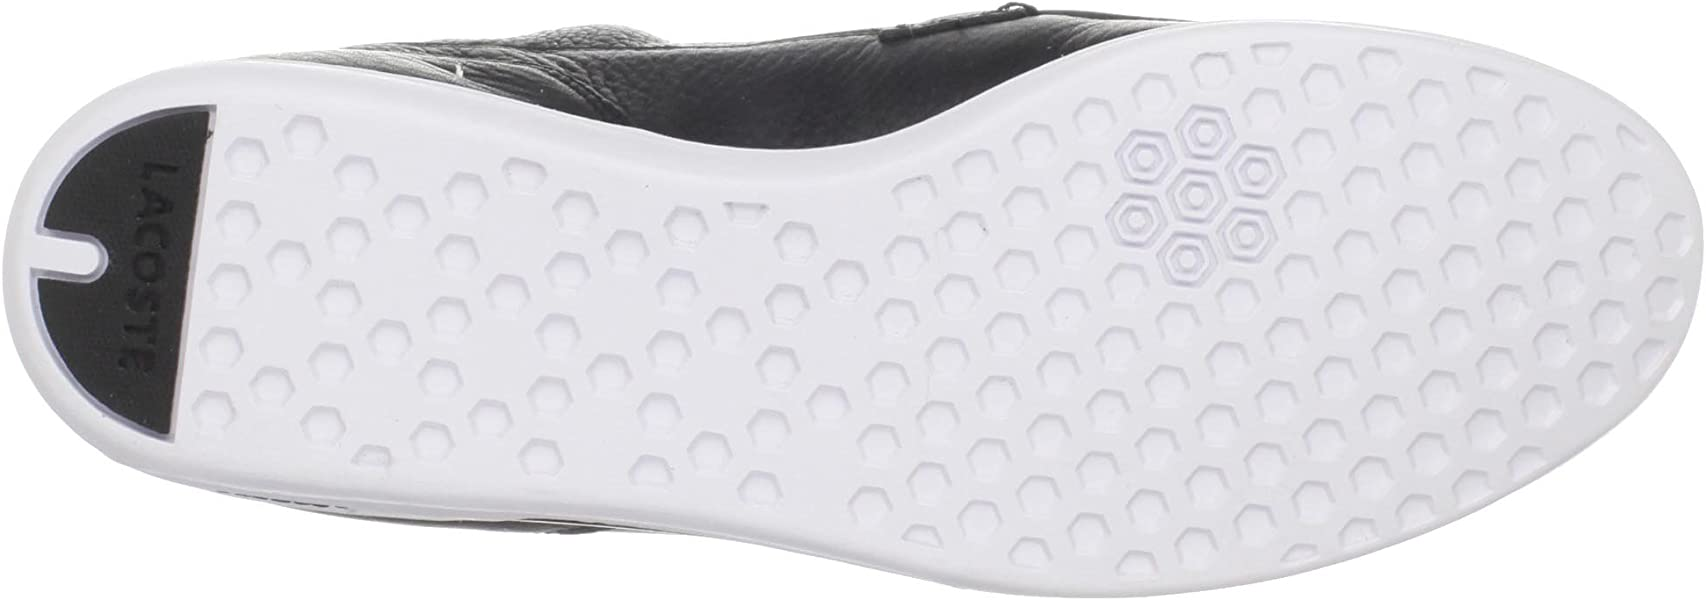 d04b4045b0eda Lacoste Dreyfus (Men) Fashion Sneaker Black Gold 7 M US. Back. Double-tap  to zoom